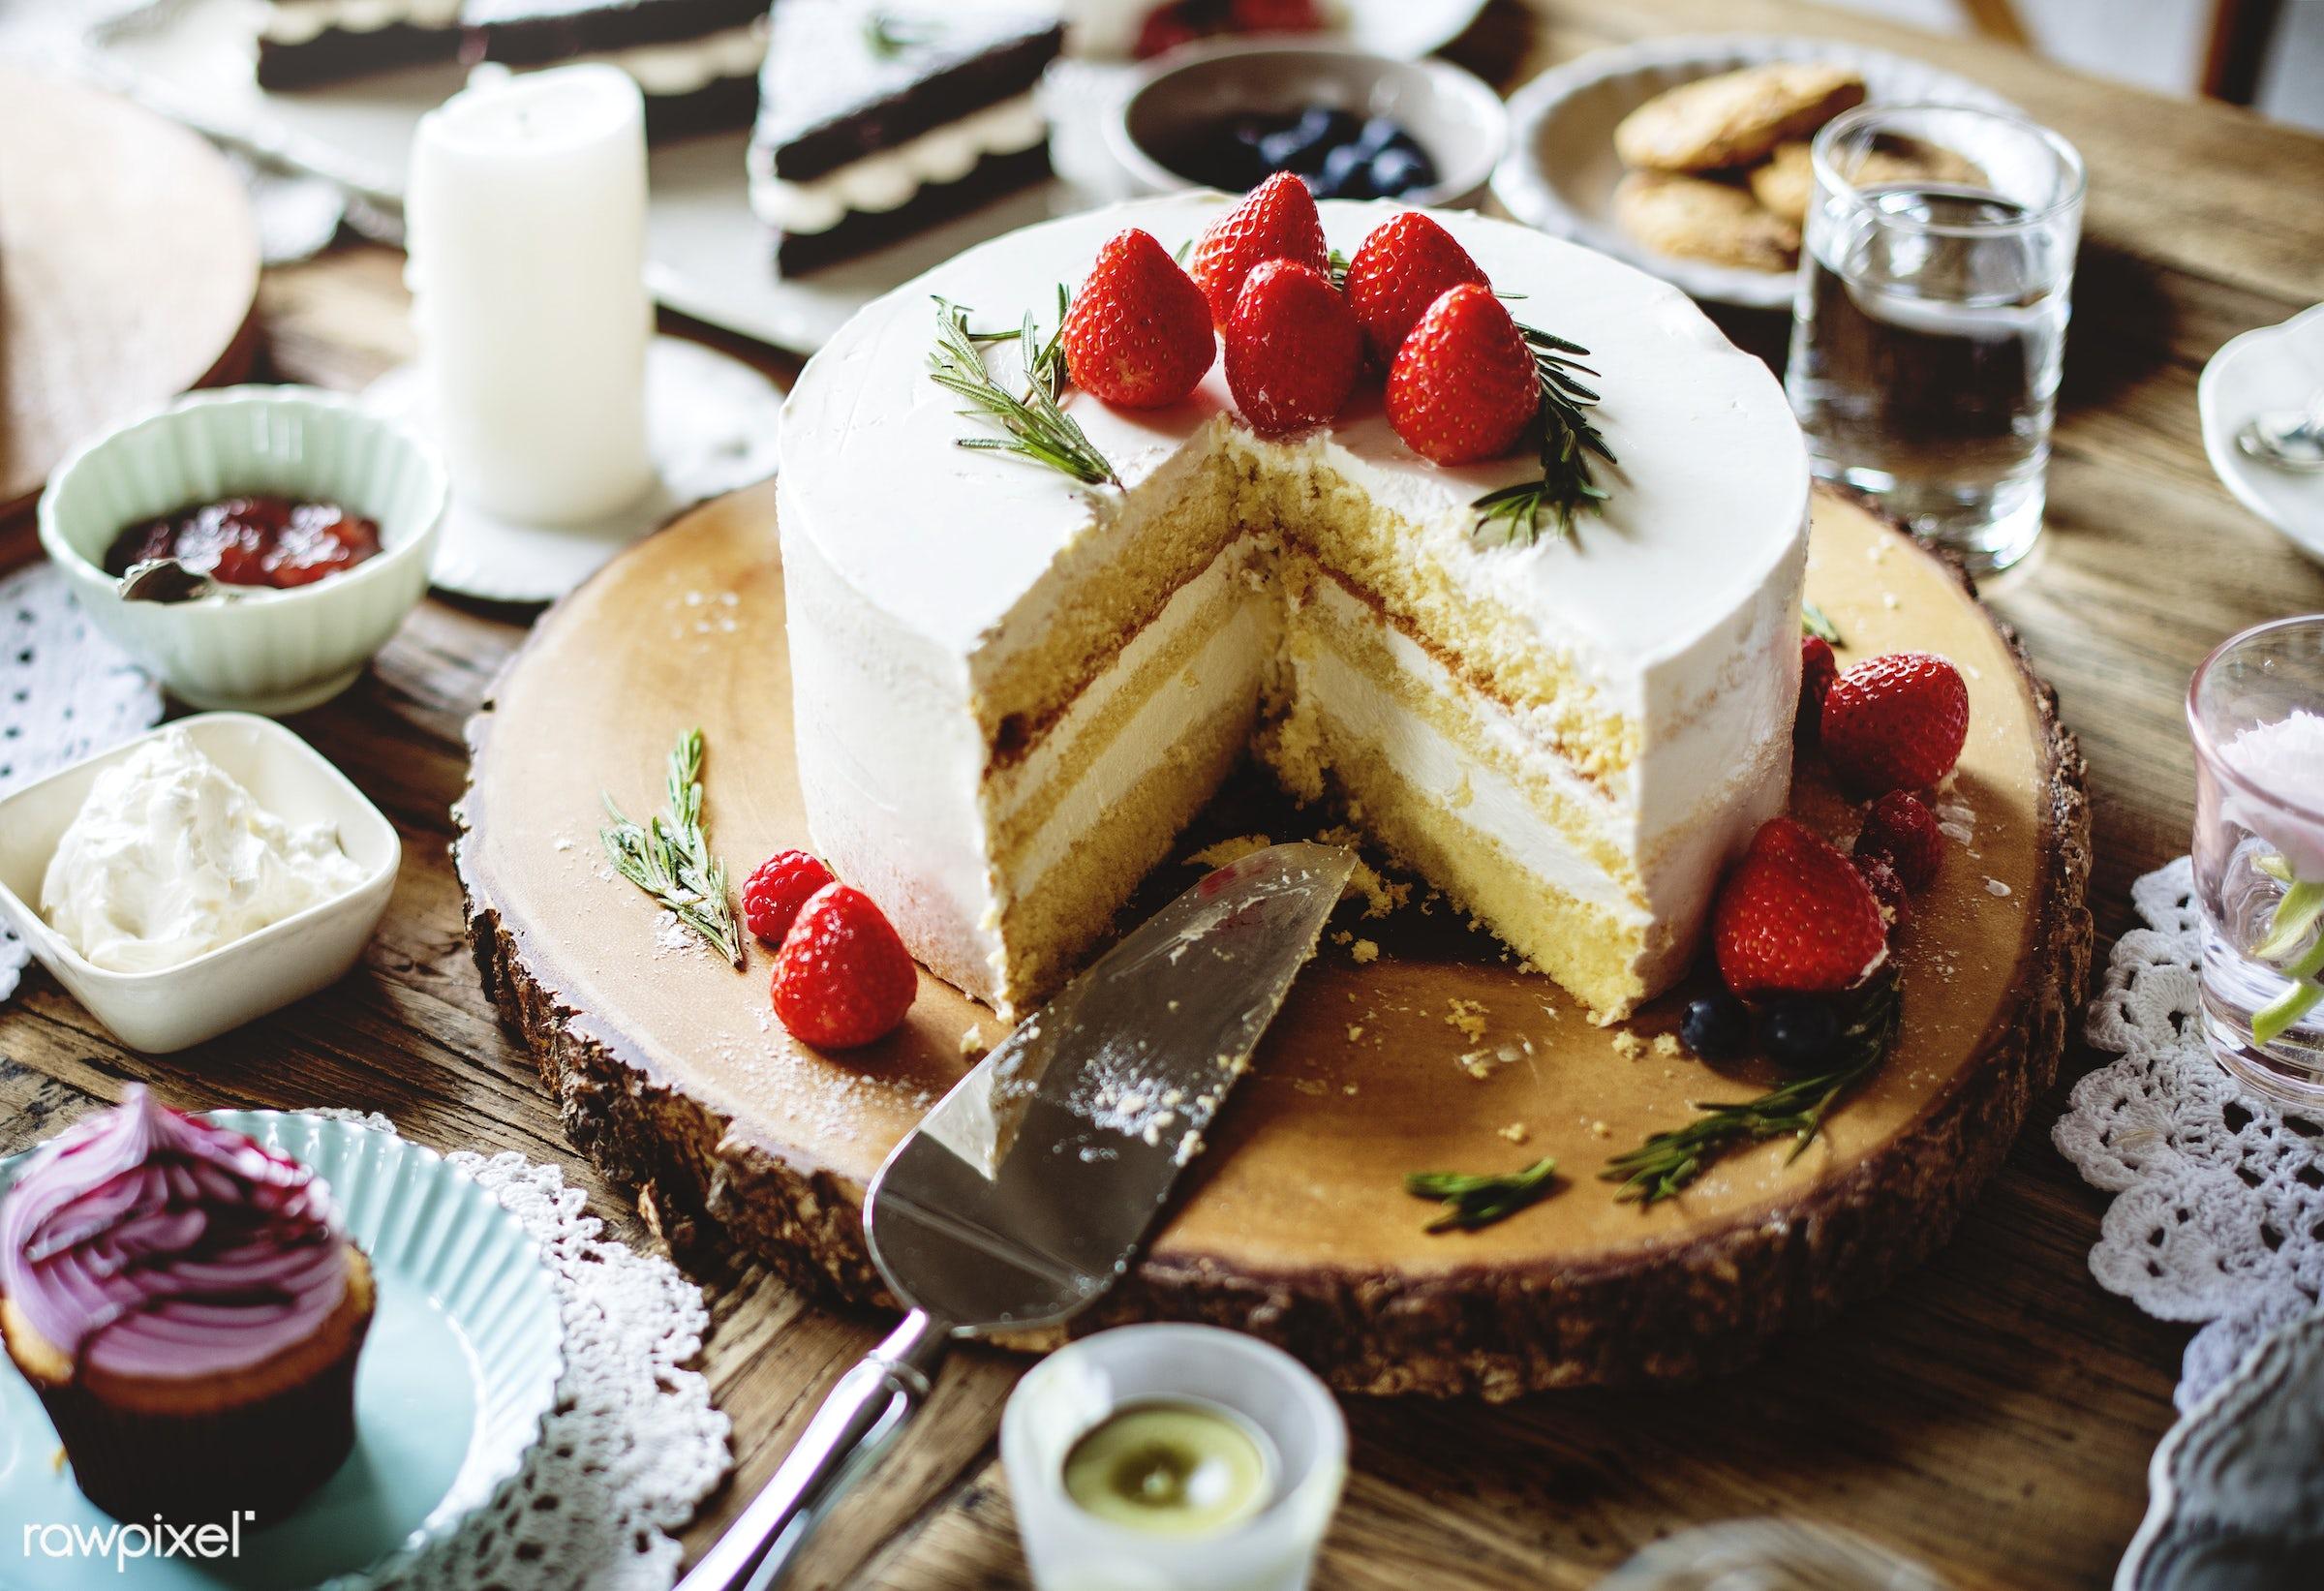 Cakes Delicious Dessert Bakery Event Party Reception - sweet, strawberry, bake, baked, bakery, birthday, break, cake, cakes...